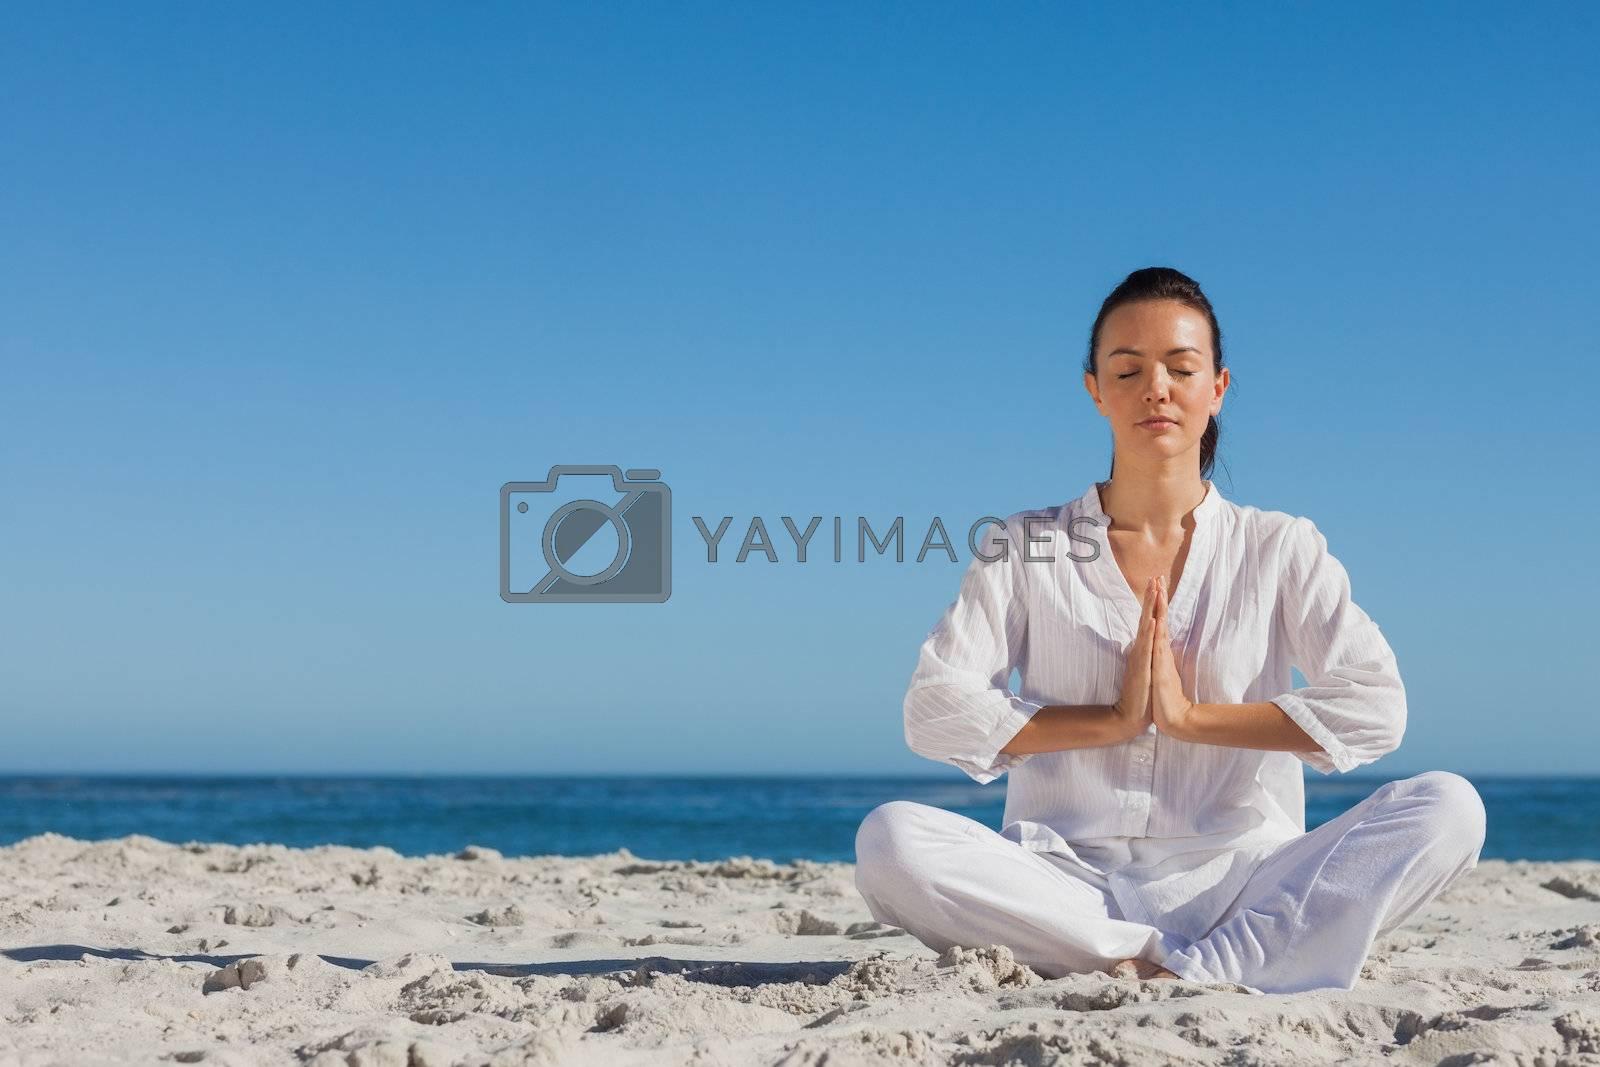 Peaceful woman practicing yoga on the beach by Wavebreakmedia